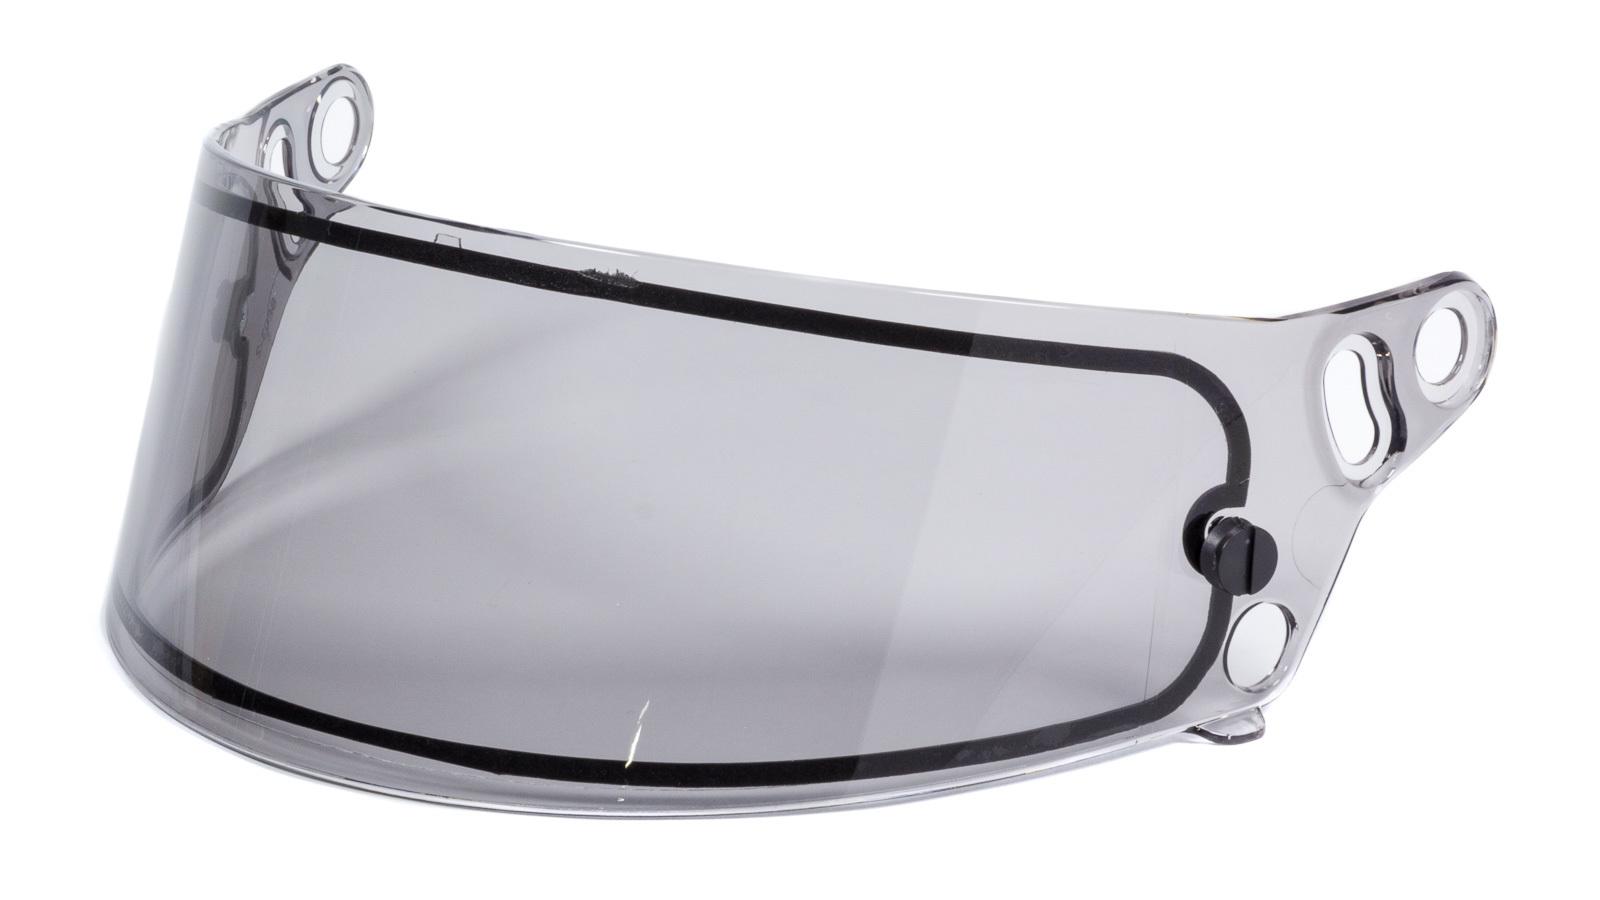 Bell Helmets Light Smoke Shield SE03 3mm